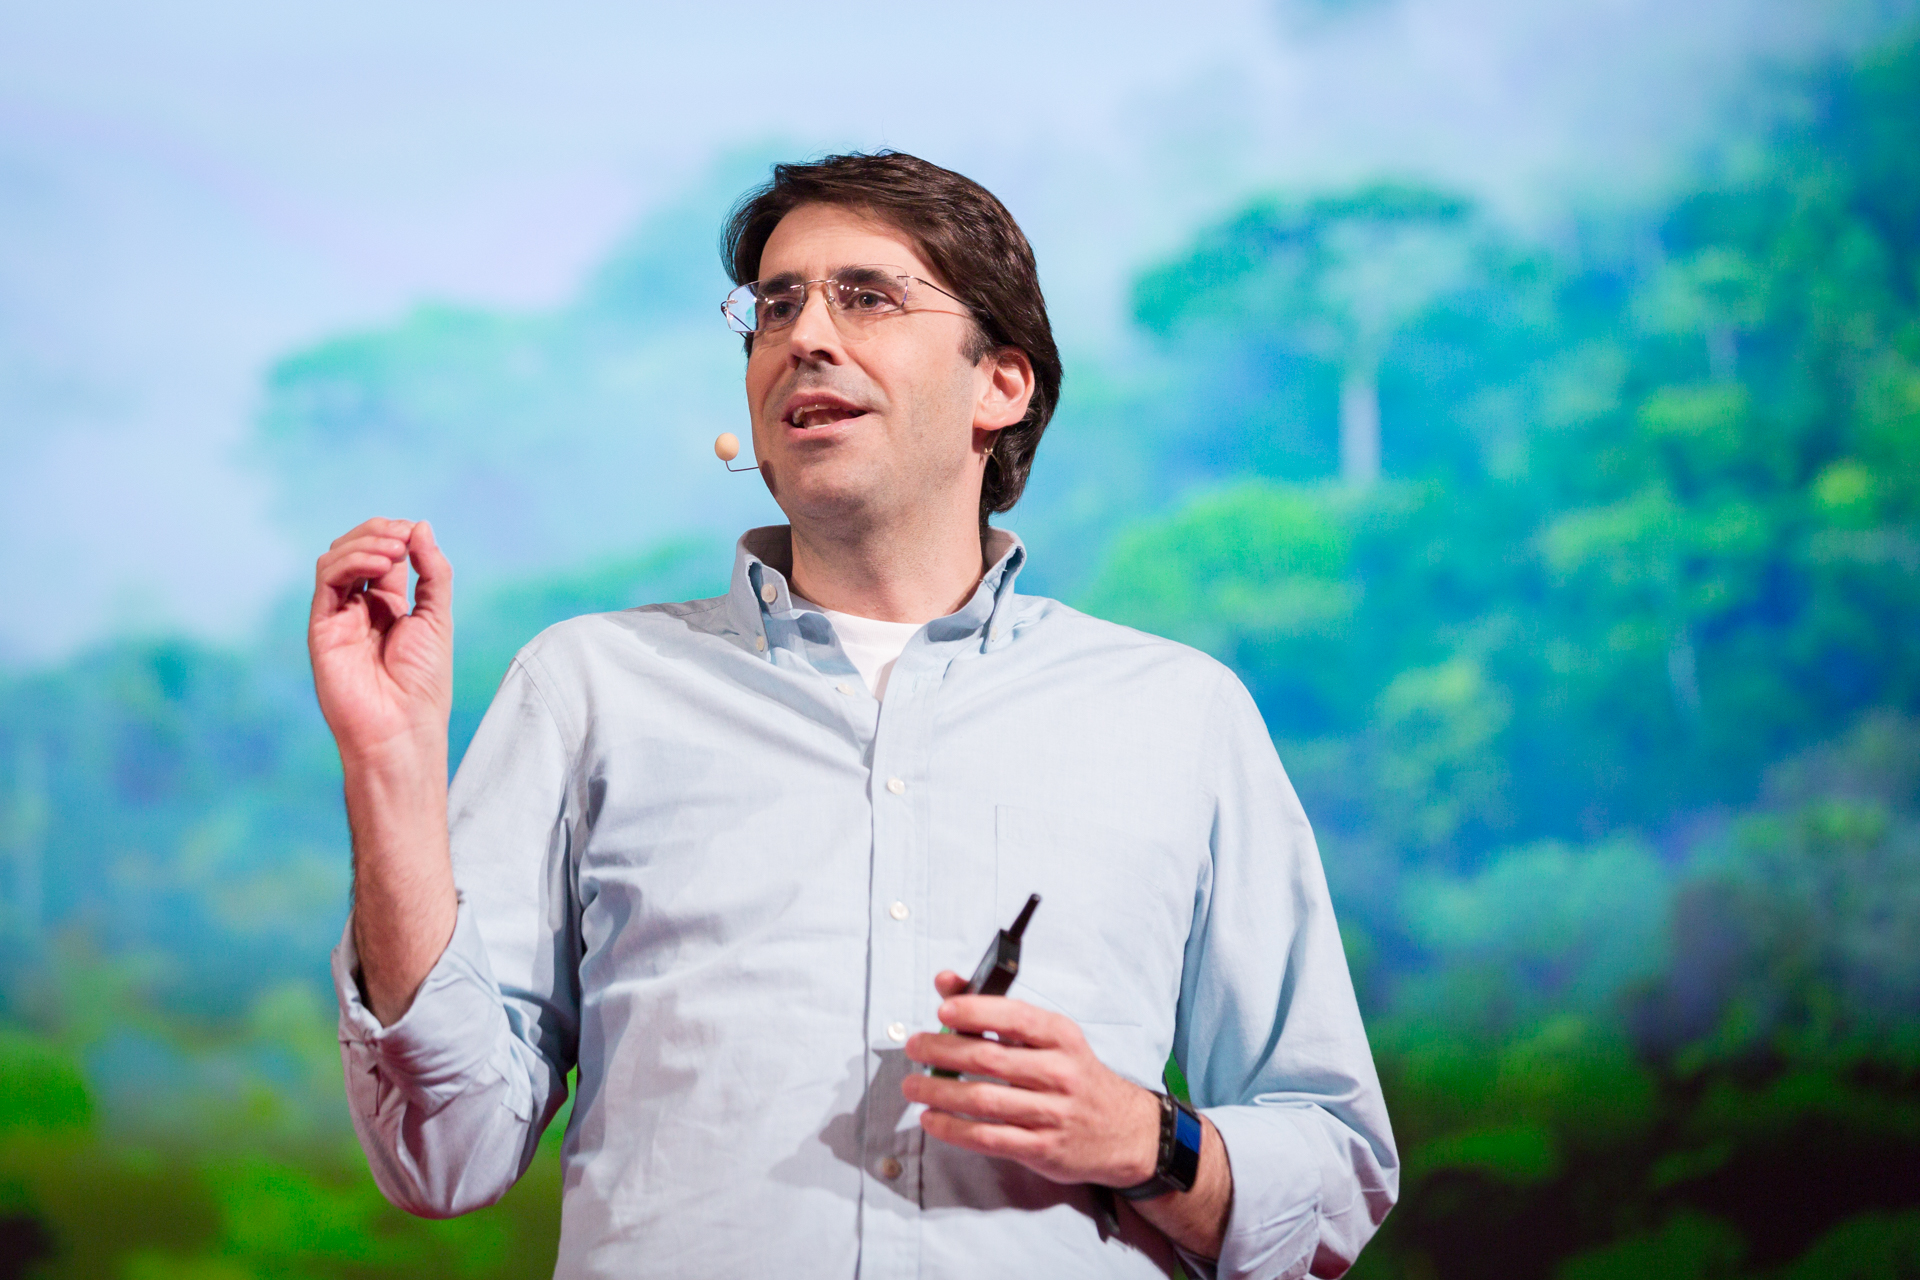 Tasso Azevedo speaks at TEDGlobal 2014.